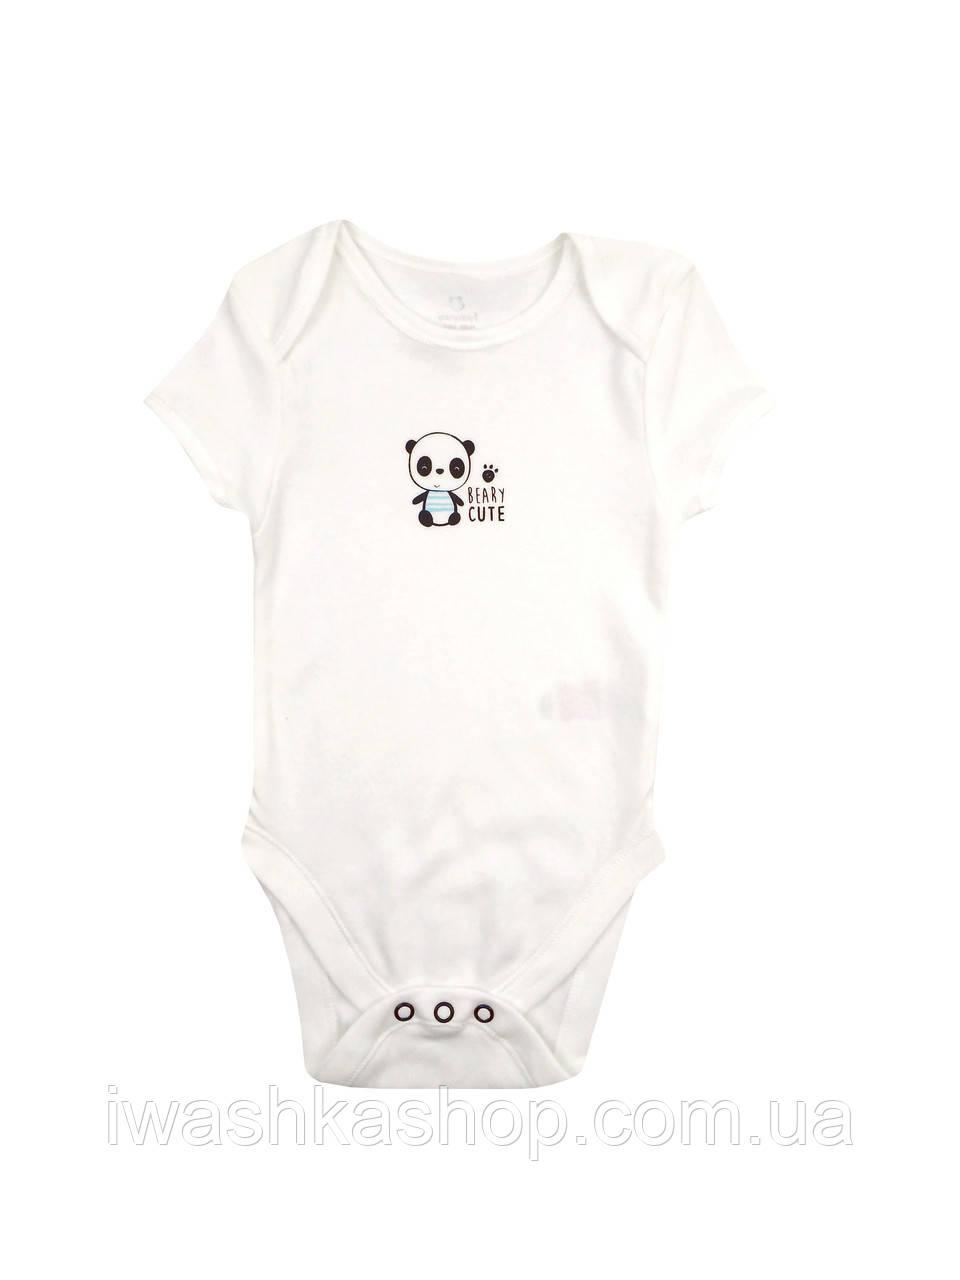 Боди с коротким рукавом с пандами для мальчика 3 - 6 месяцев, р. 68, Early days by Primark